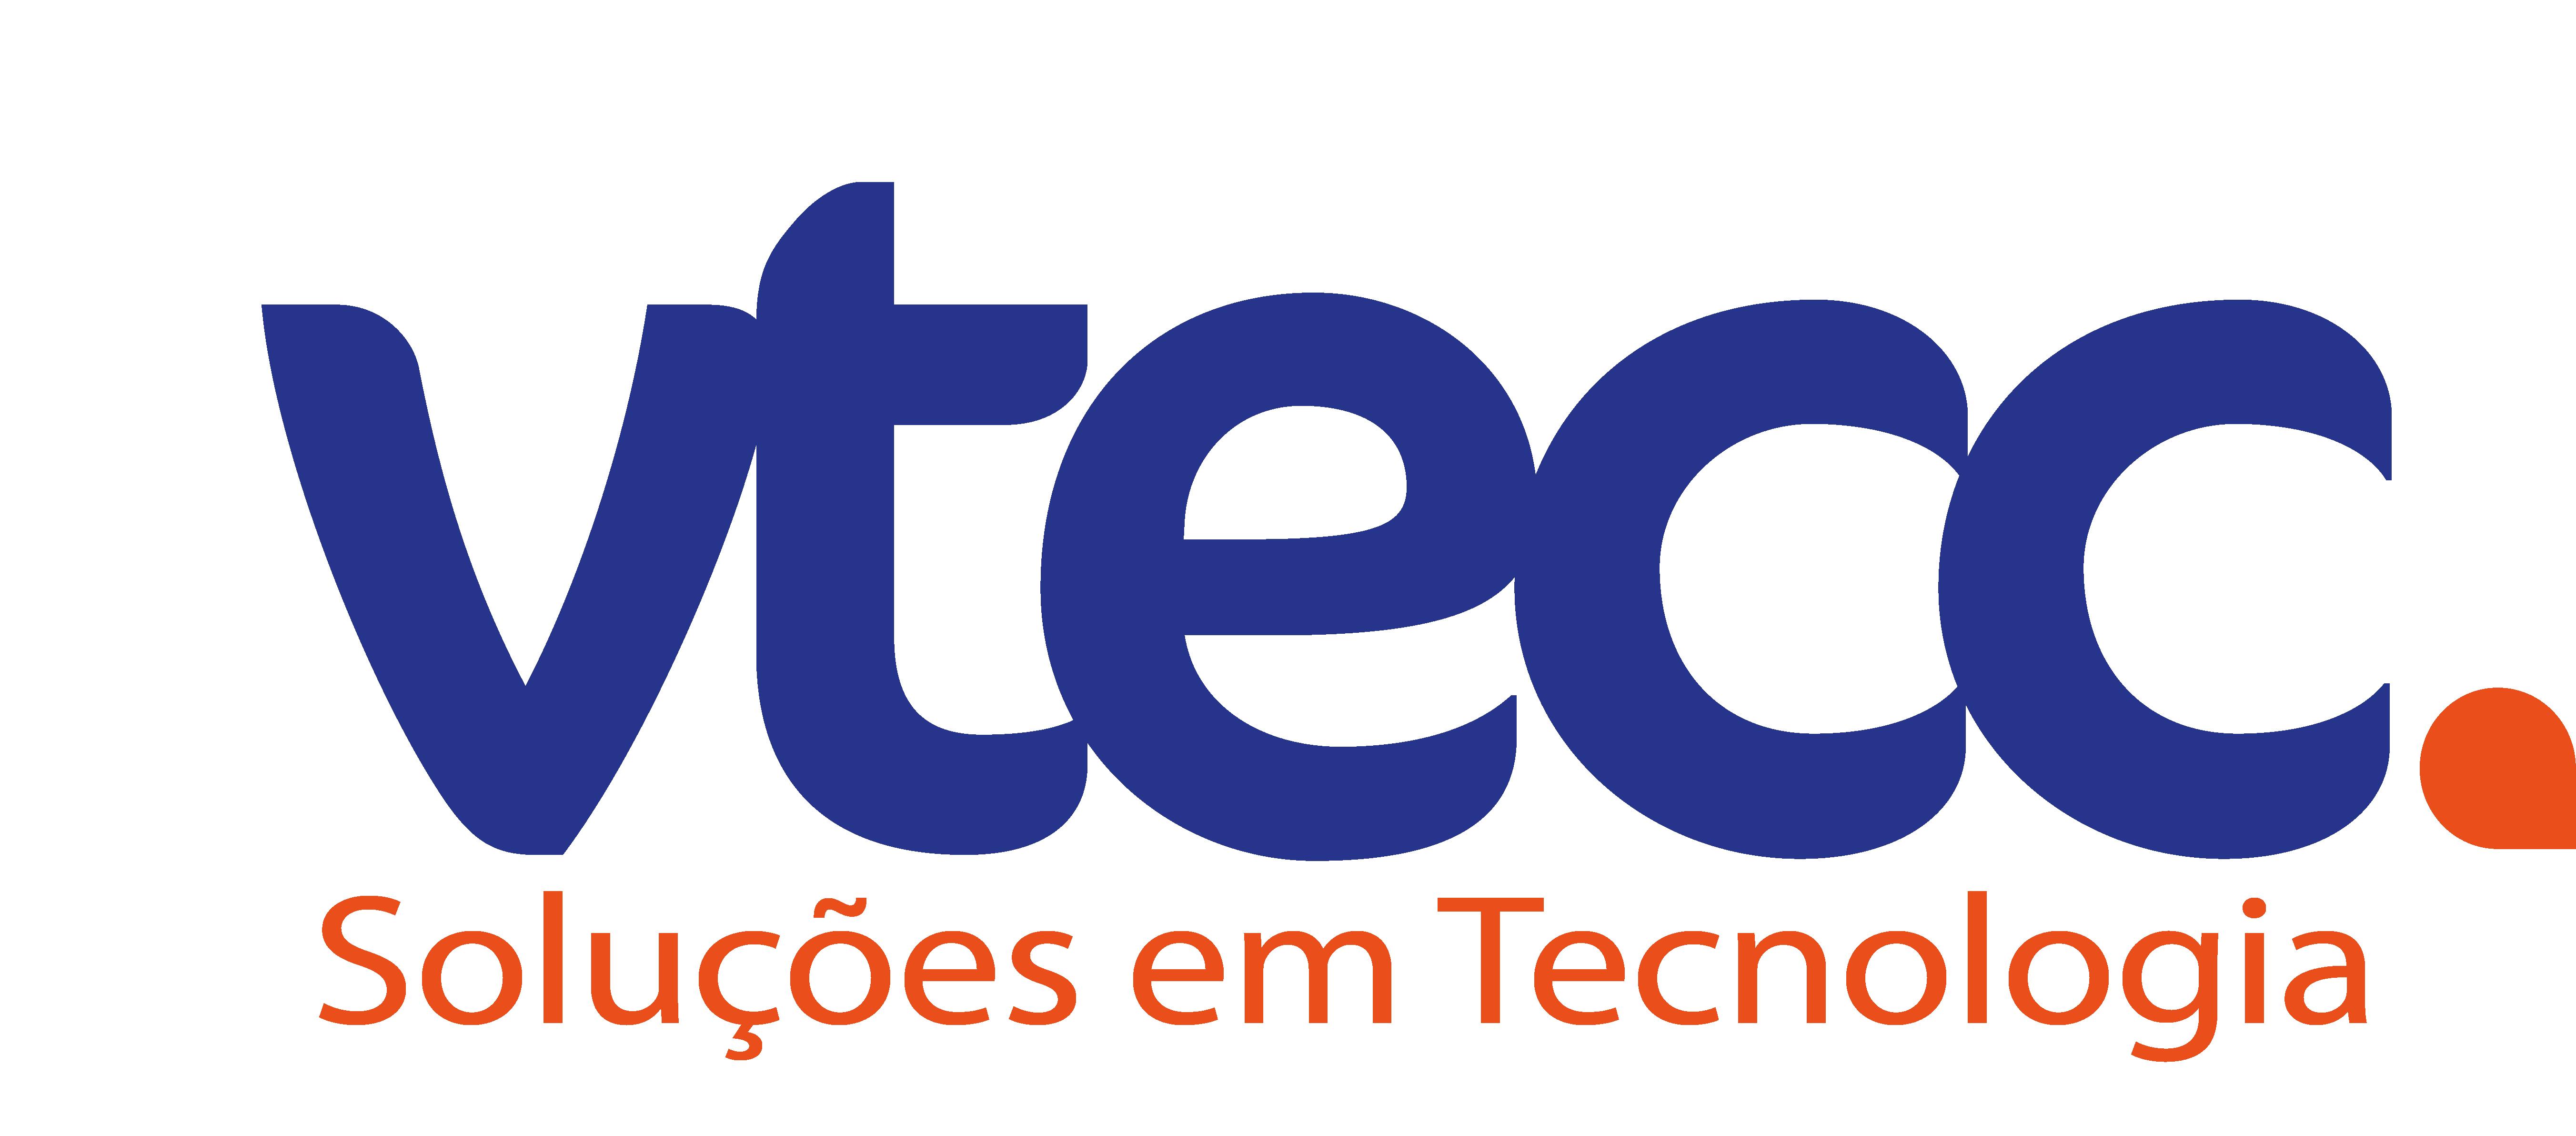 Virtualtv